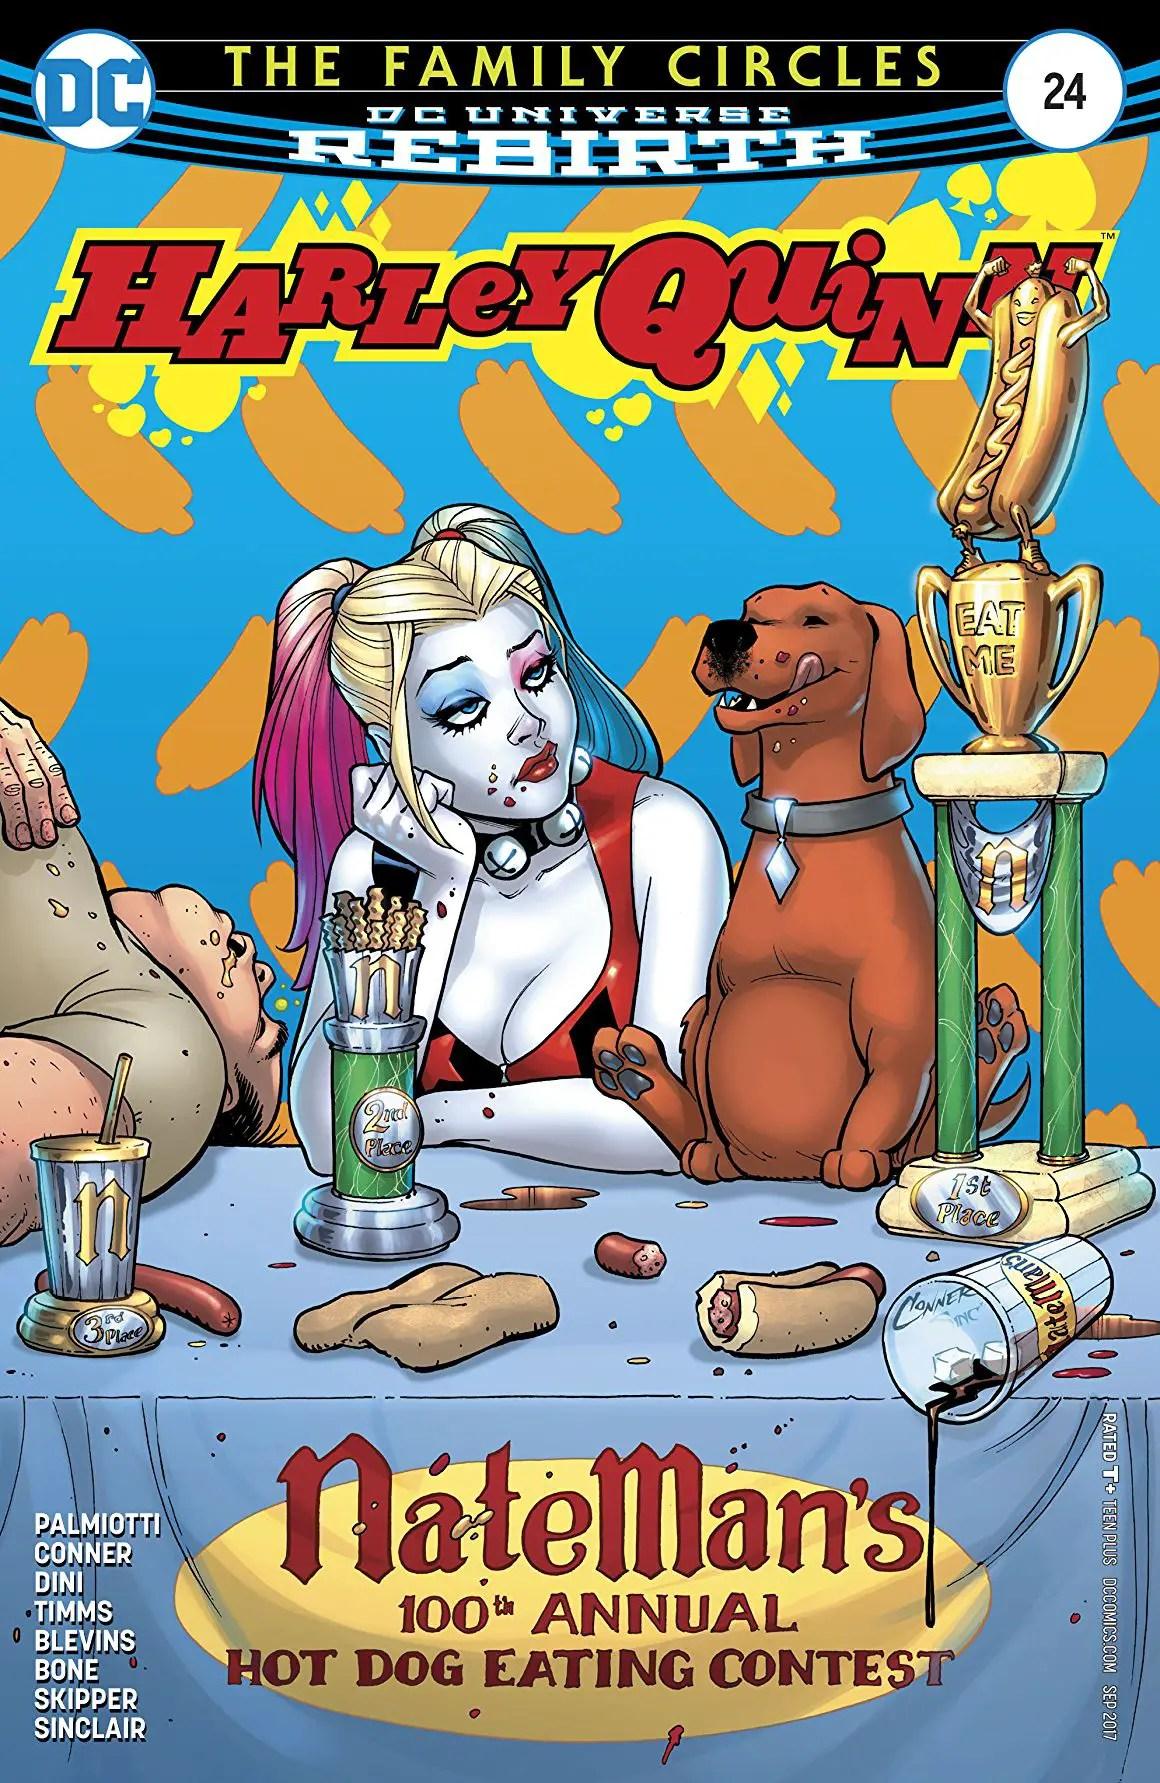 Harley Quinn #24 Review